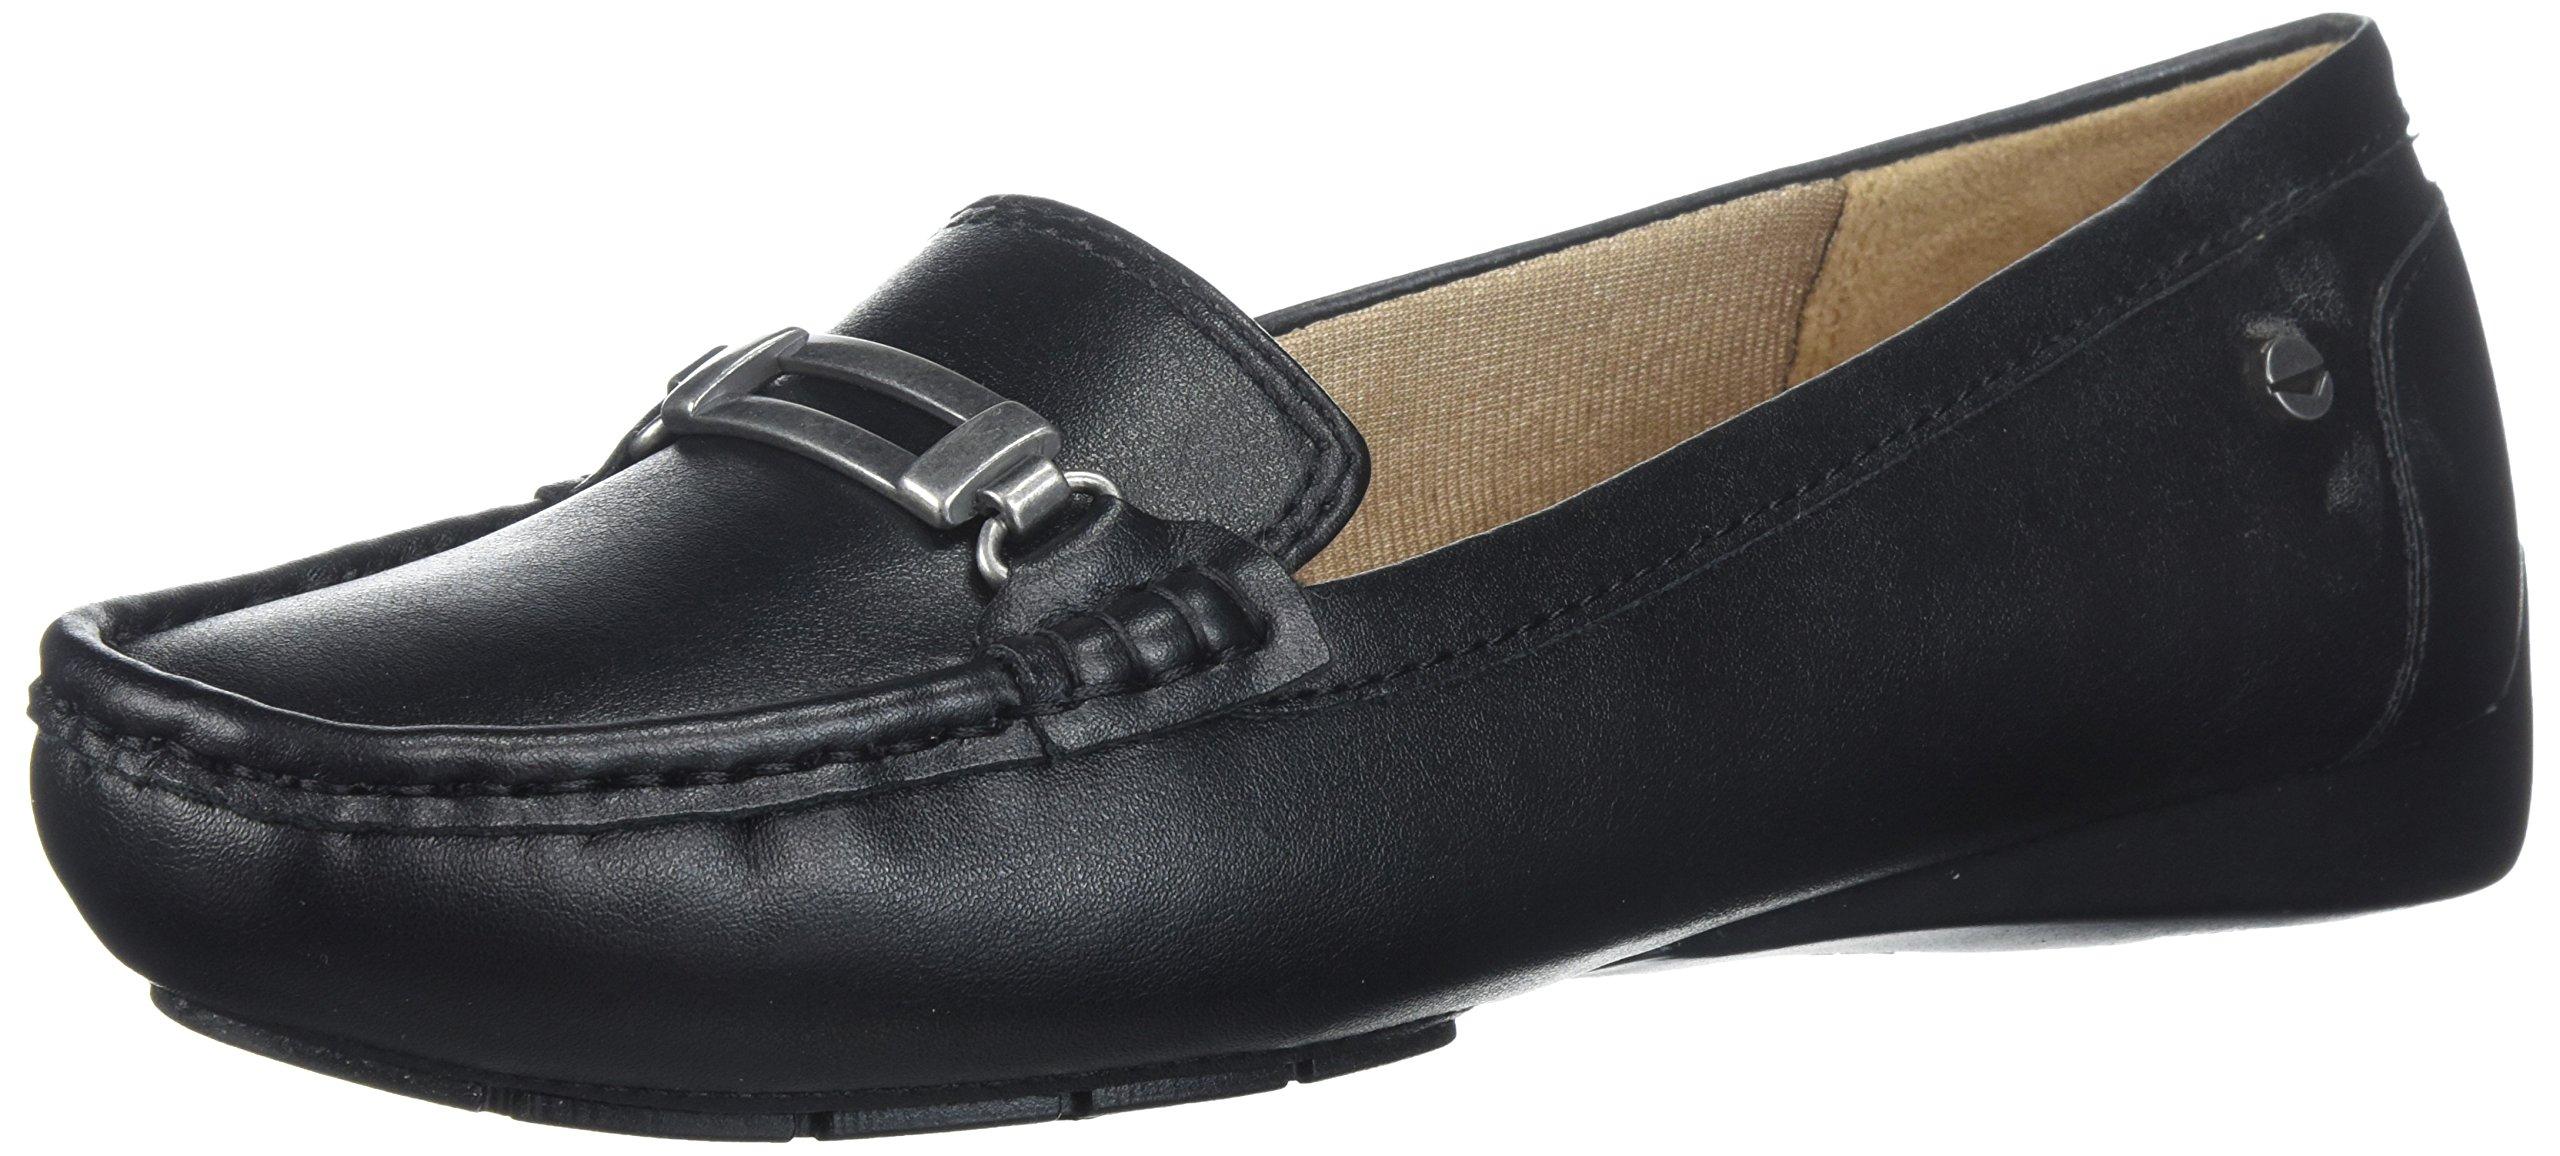 LifeStride Women's Viana Driving Style Loafer, Black, 9 M US